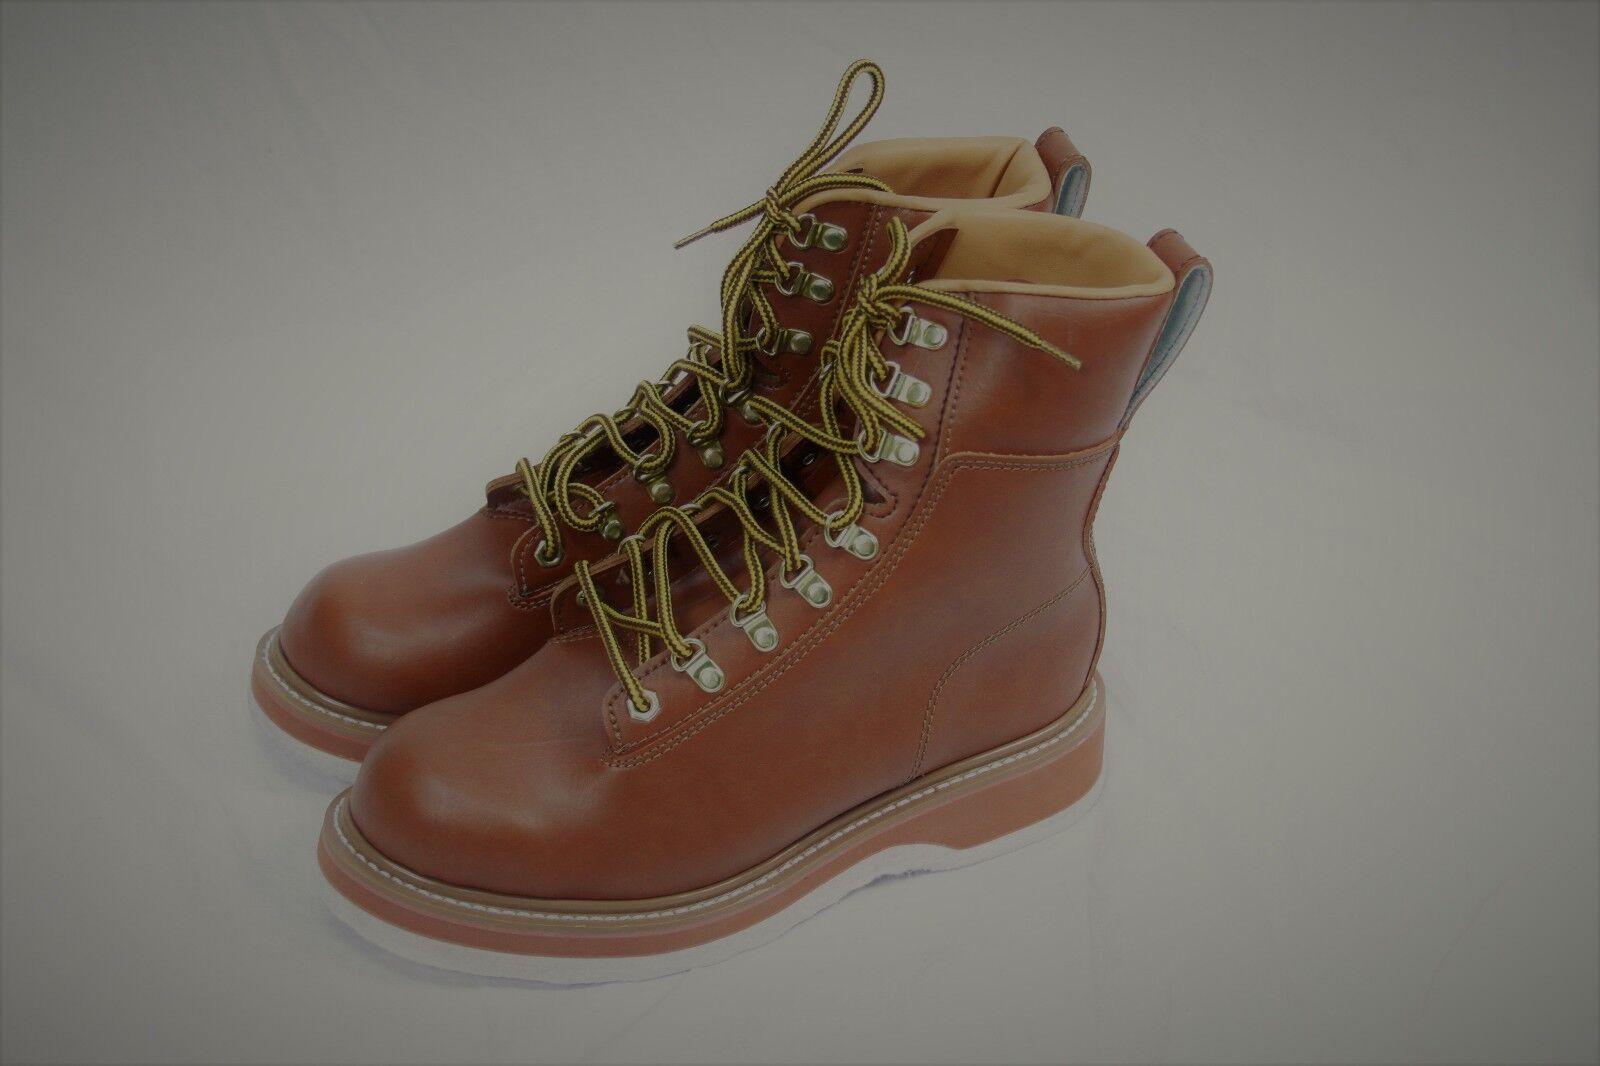 Authentic Cabela's Men's Non Slip brown leather Boots US 9